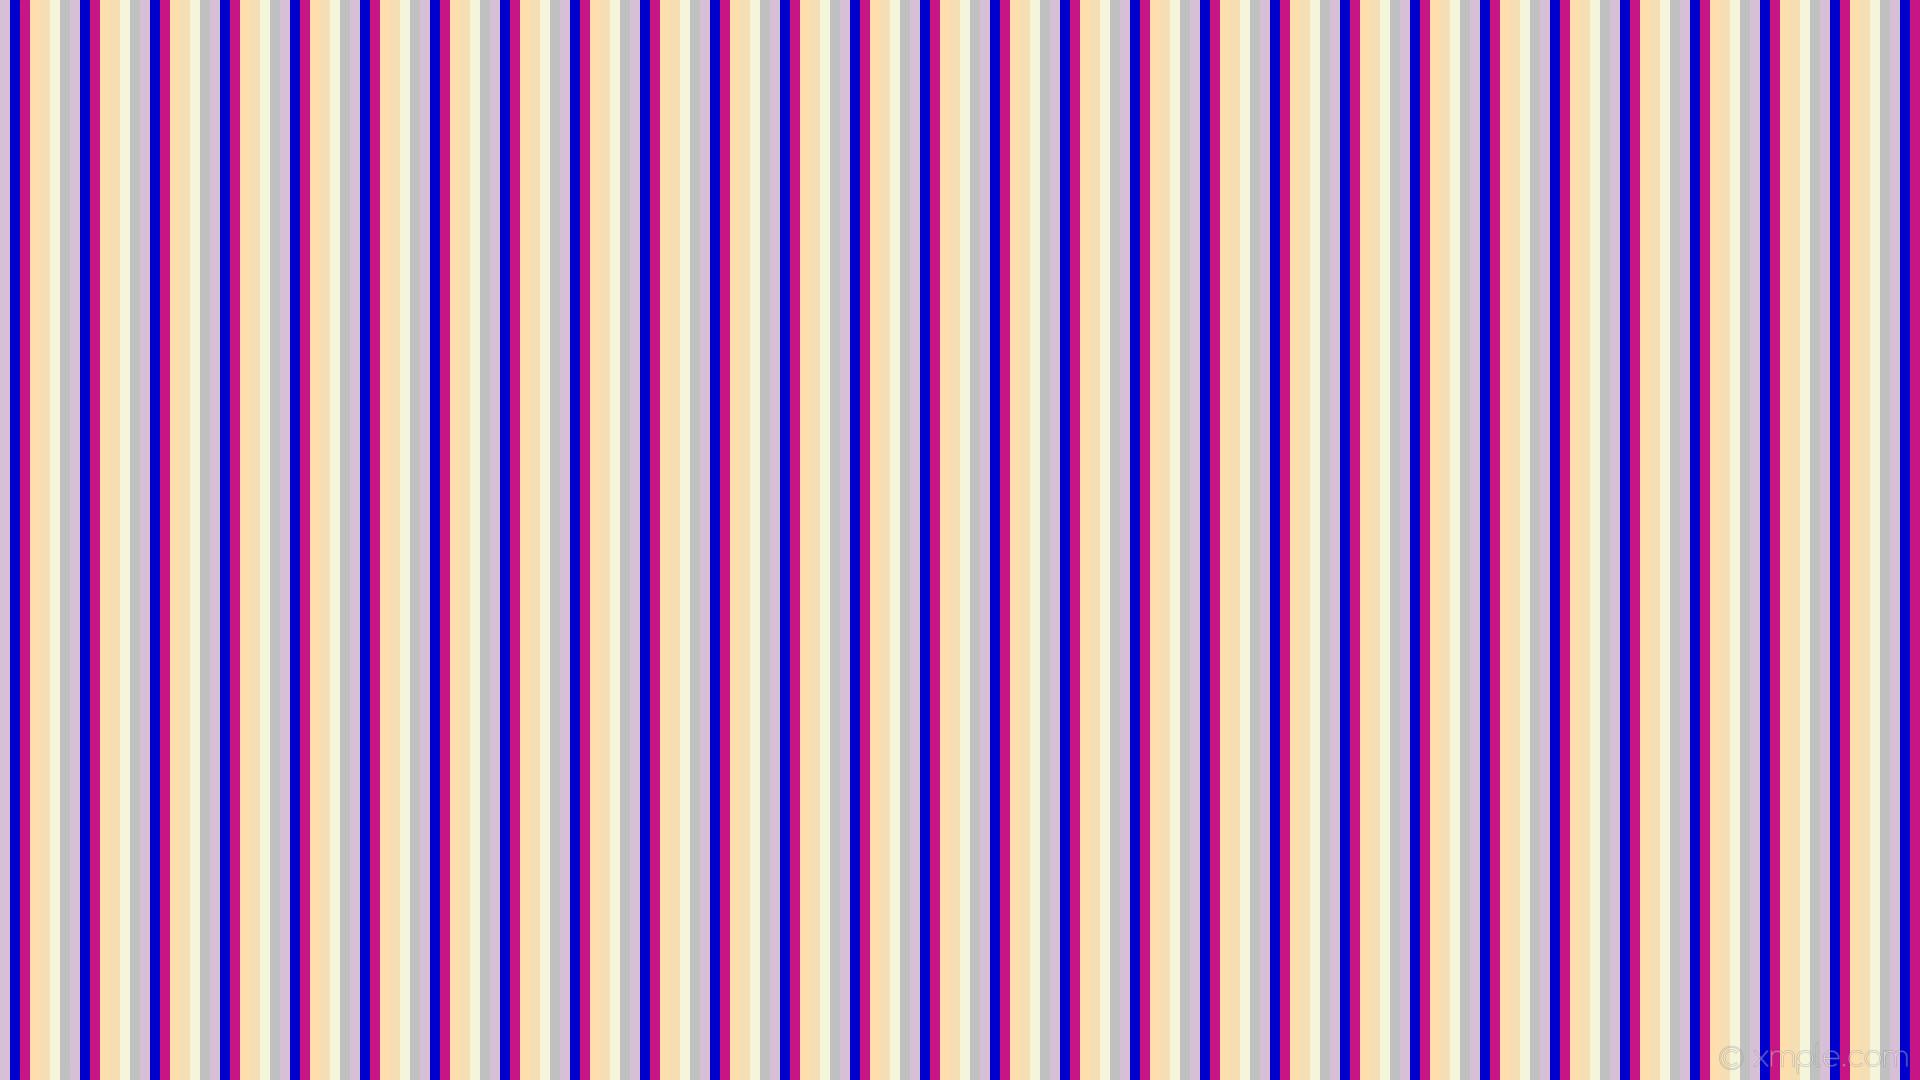 wallpaper streaks white stripes grey pink lines purple brown blue wheat  navajo white medium violet red